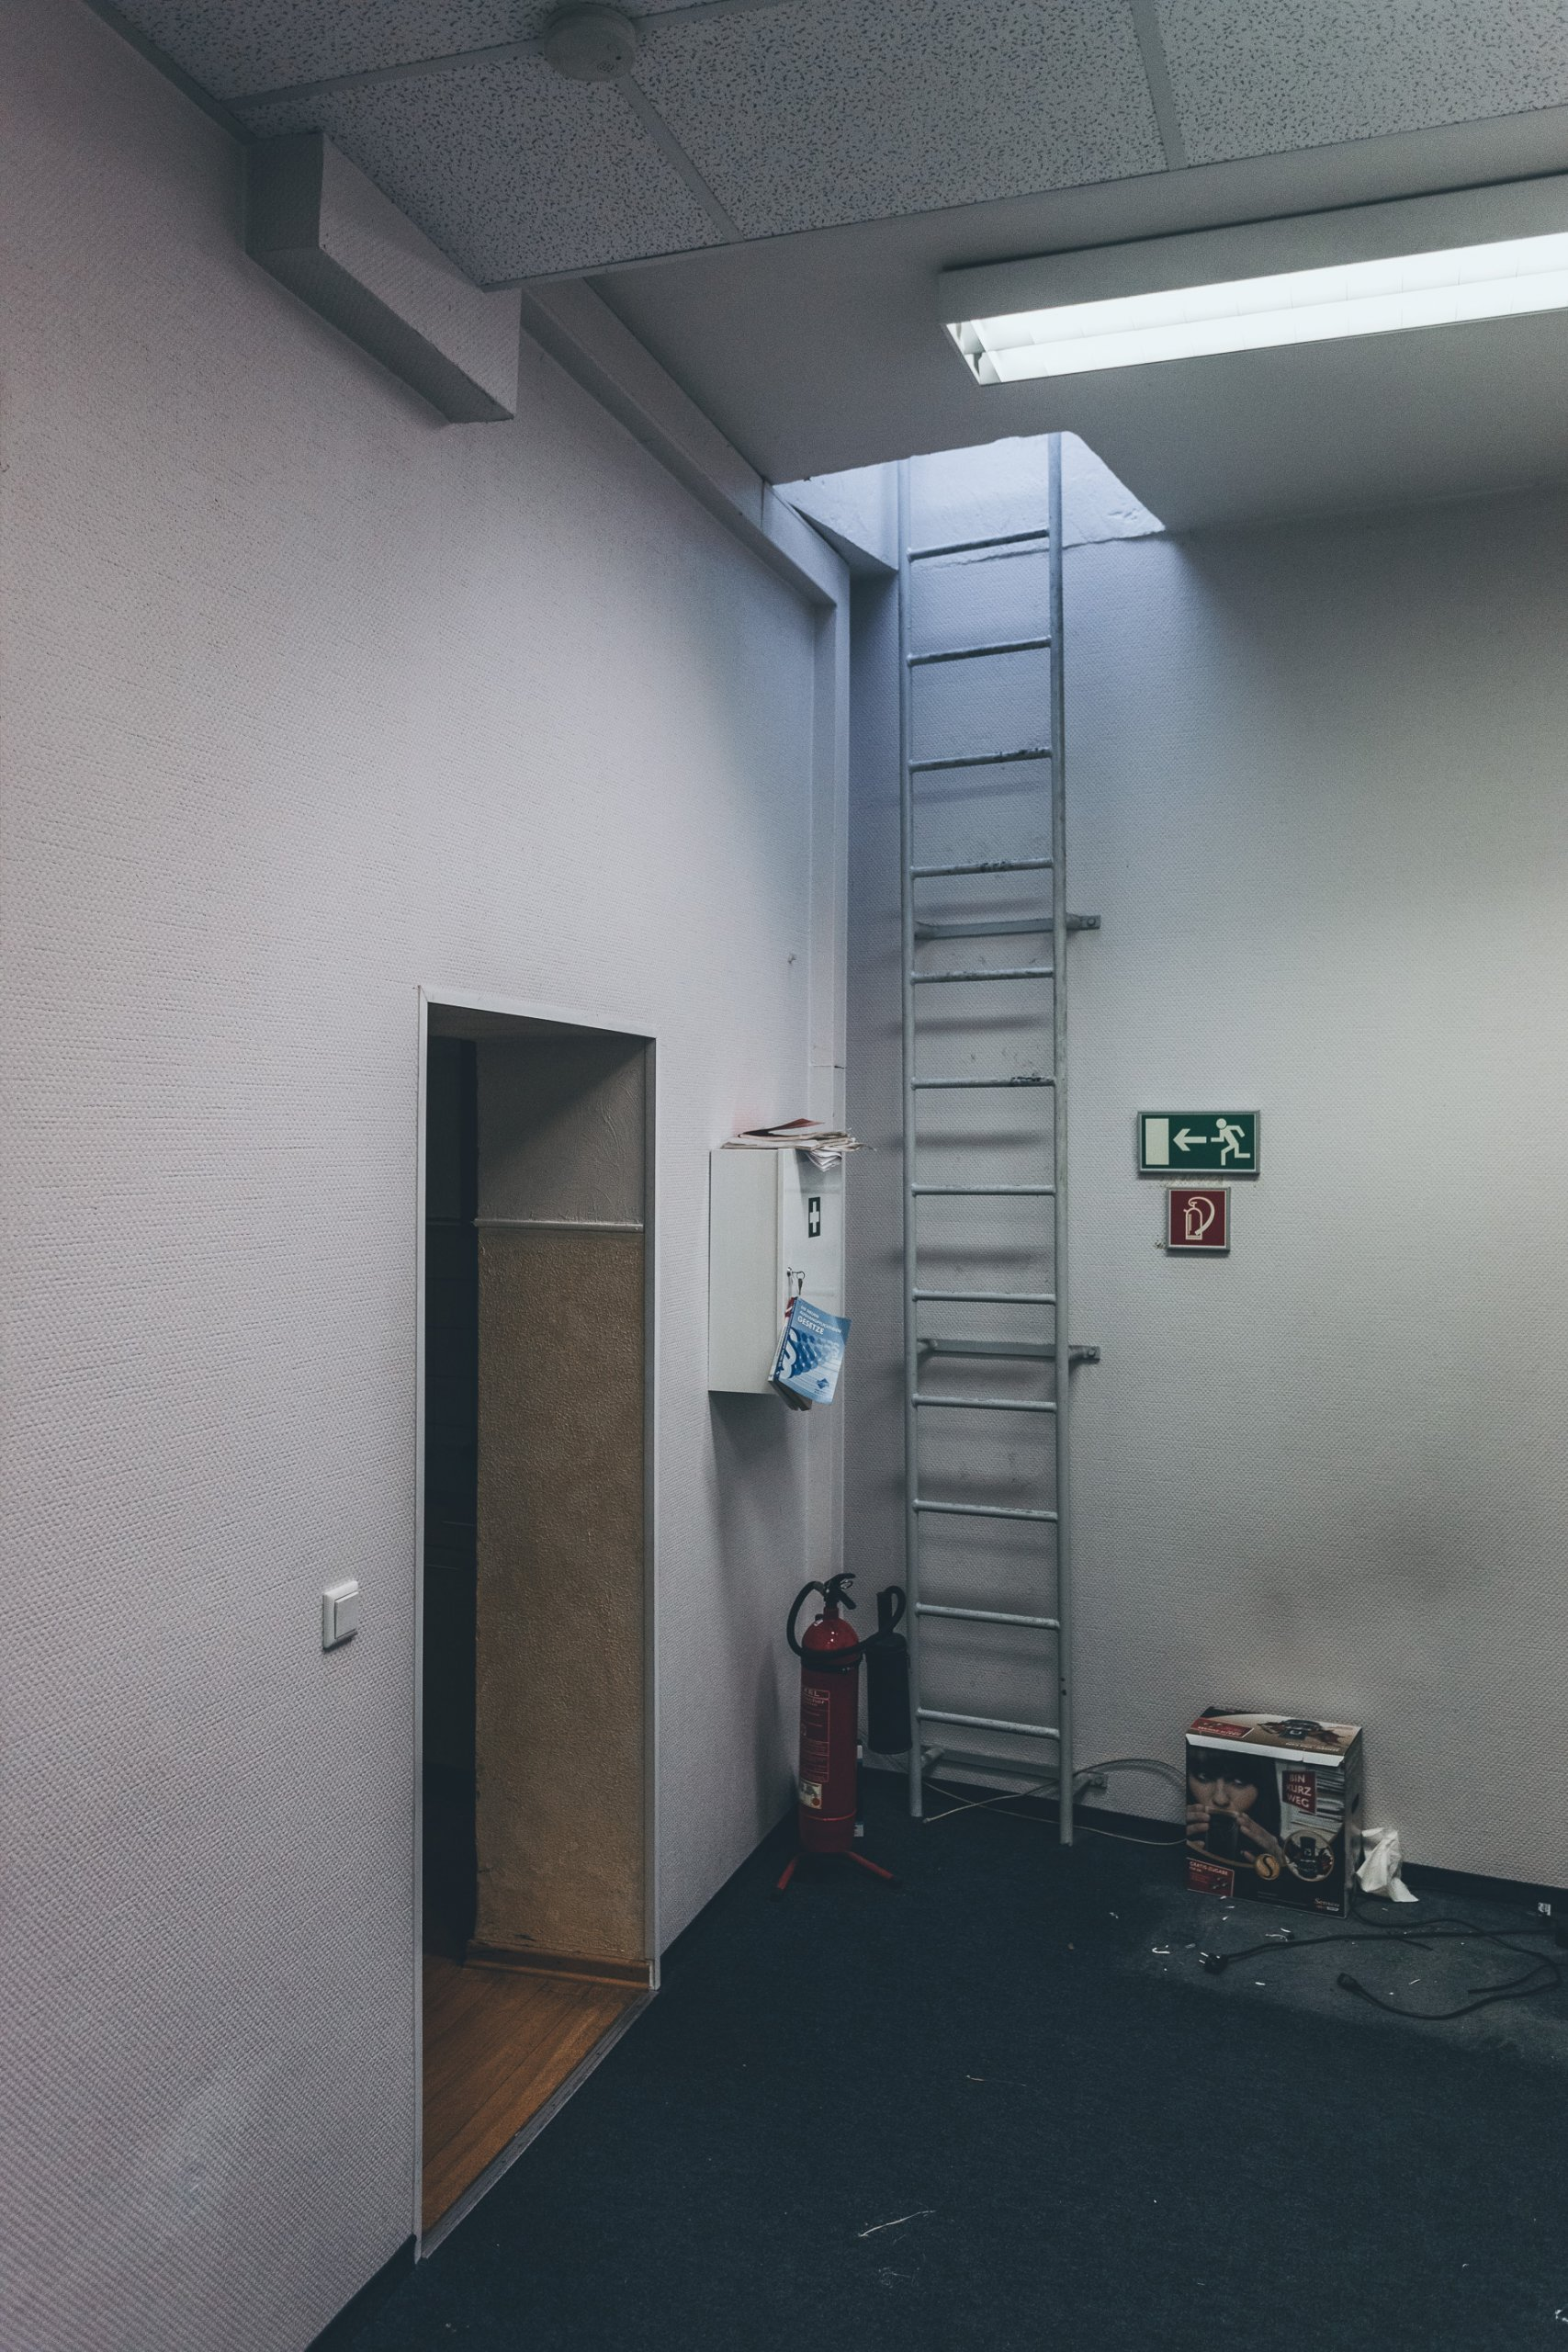 Das verlassene Bürogebäude in NRW